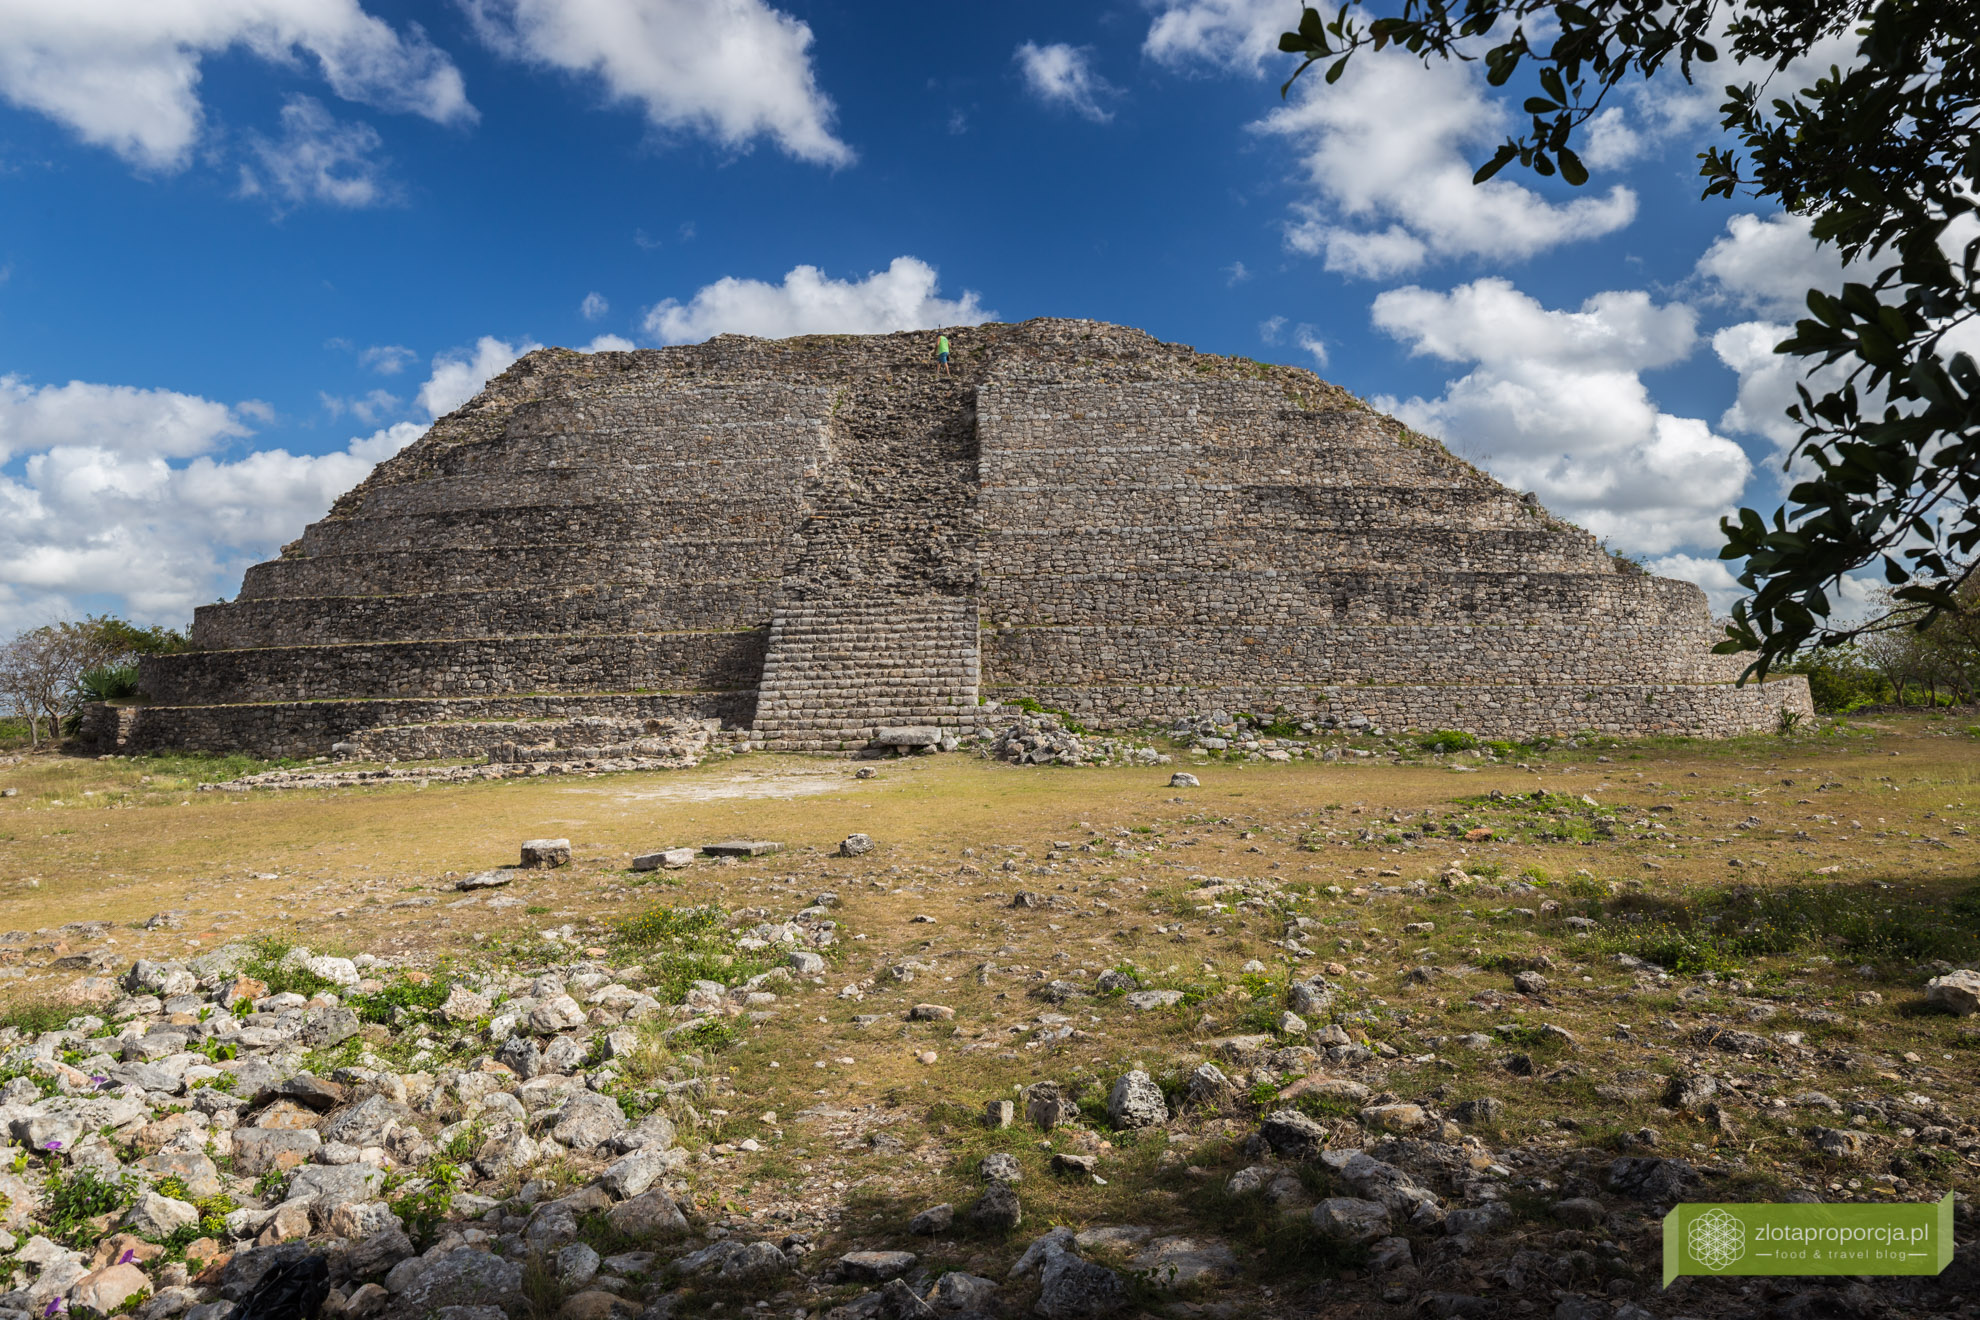 Izamal, żółte miasto, Jukatan, Jukatan atrakcje, Meksyk, piramidy w Izamal, Wielka Piramida